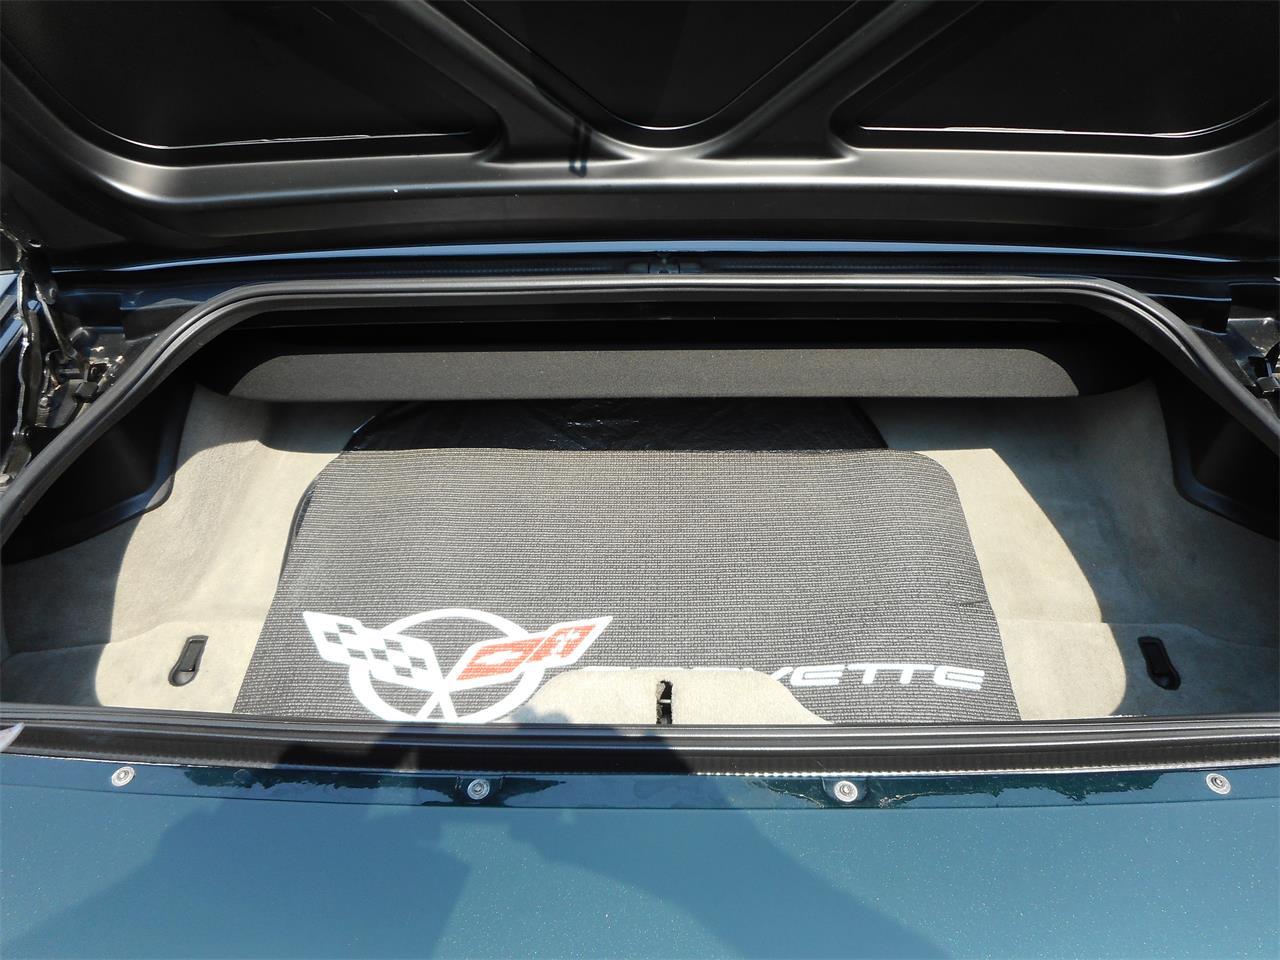 2000 Chevrolet Corvette (CC-1386570) for sale in Gilroy, California